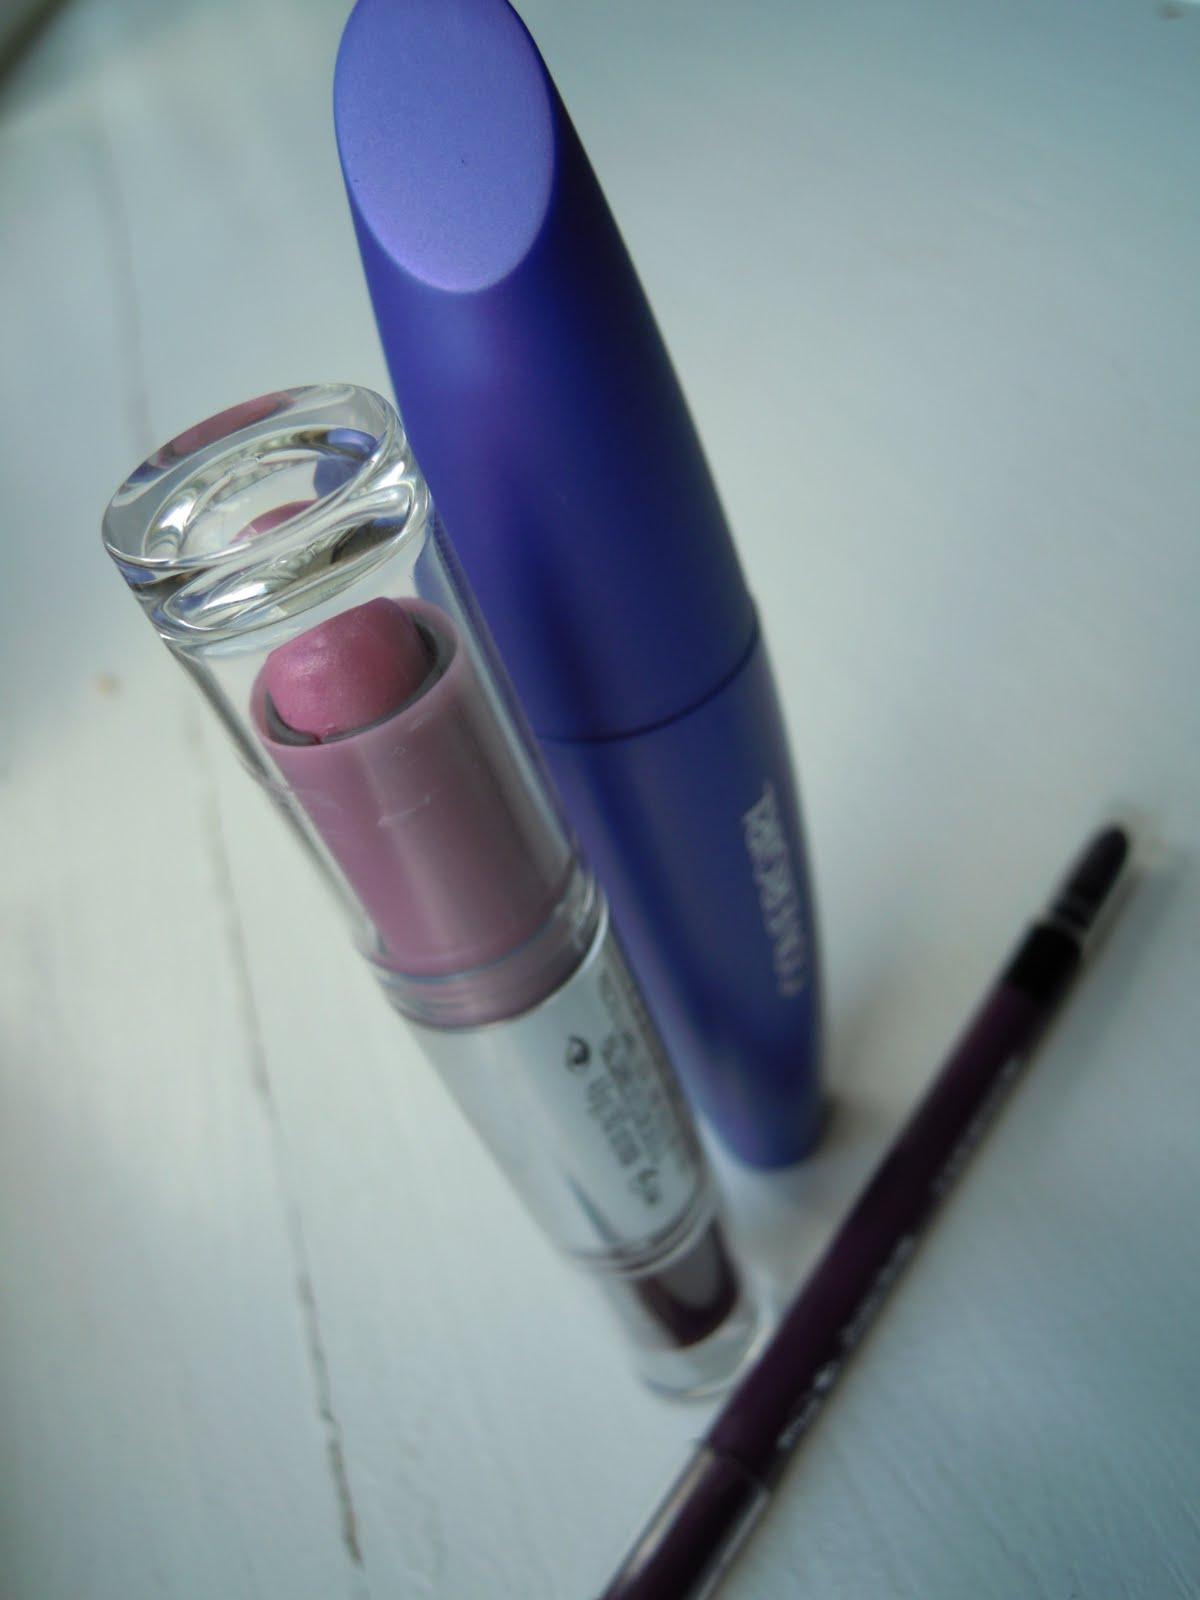 including Smoky Shadow Blast in Purple Plume, Liquidline Blast in Violet